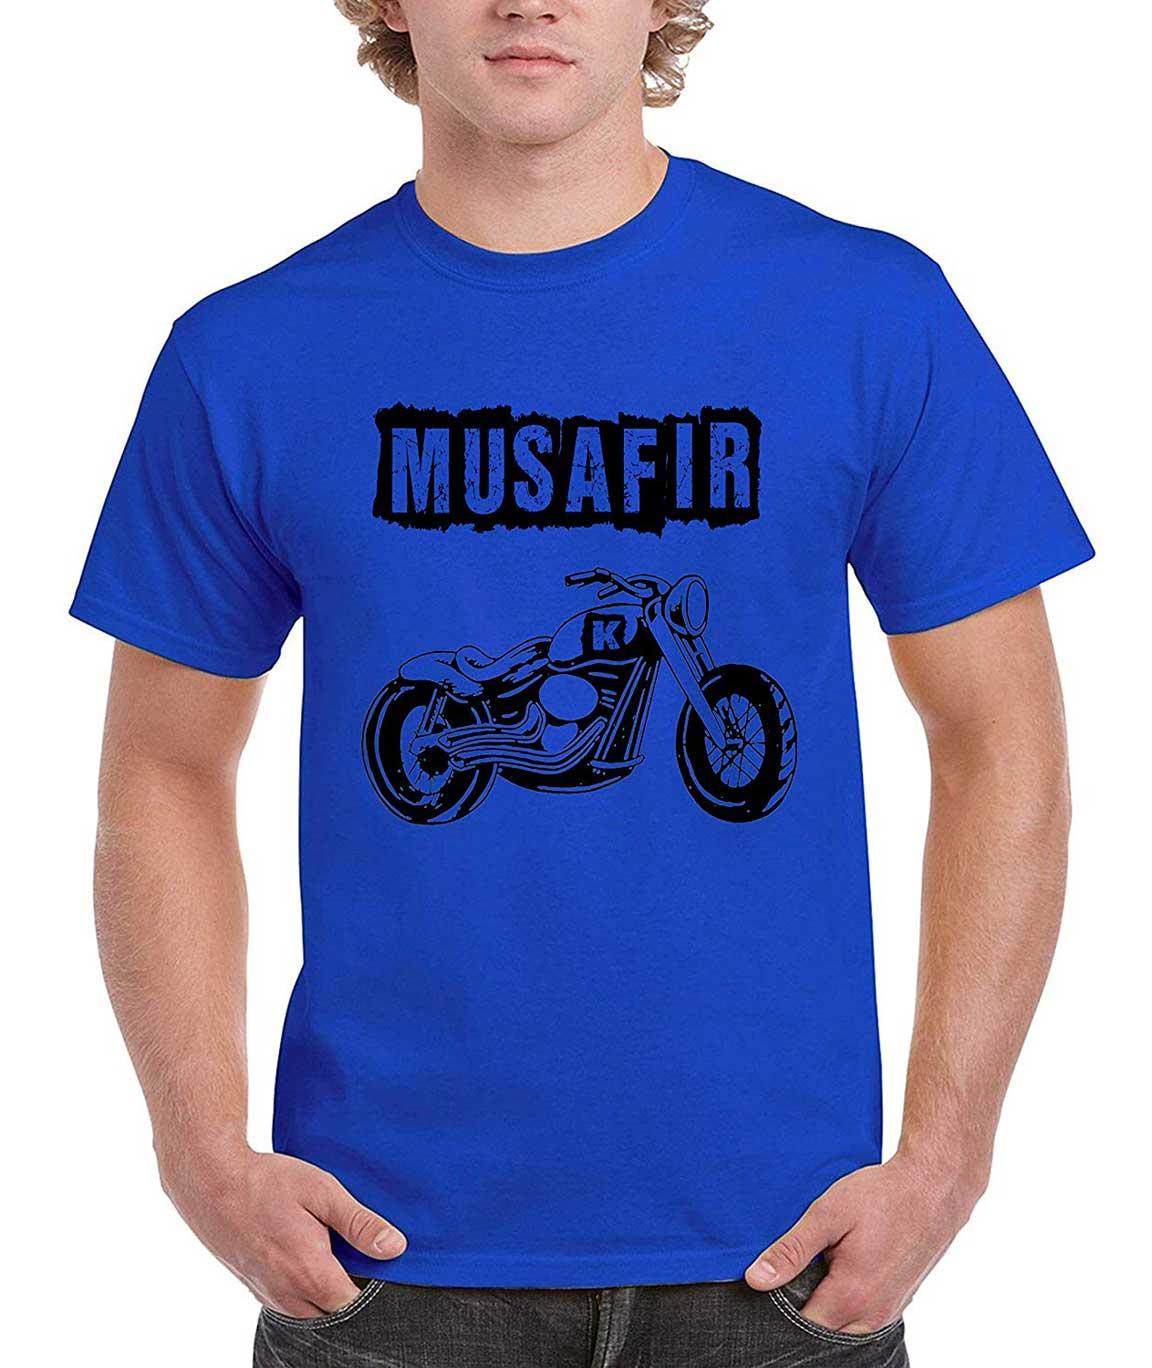 Vestiario Super Dry Fit Printed Round Neck Blue T-Shirt